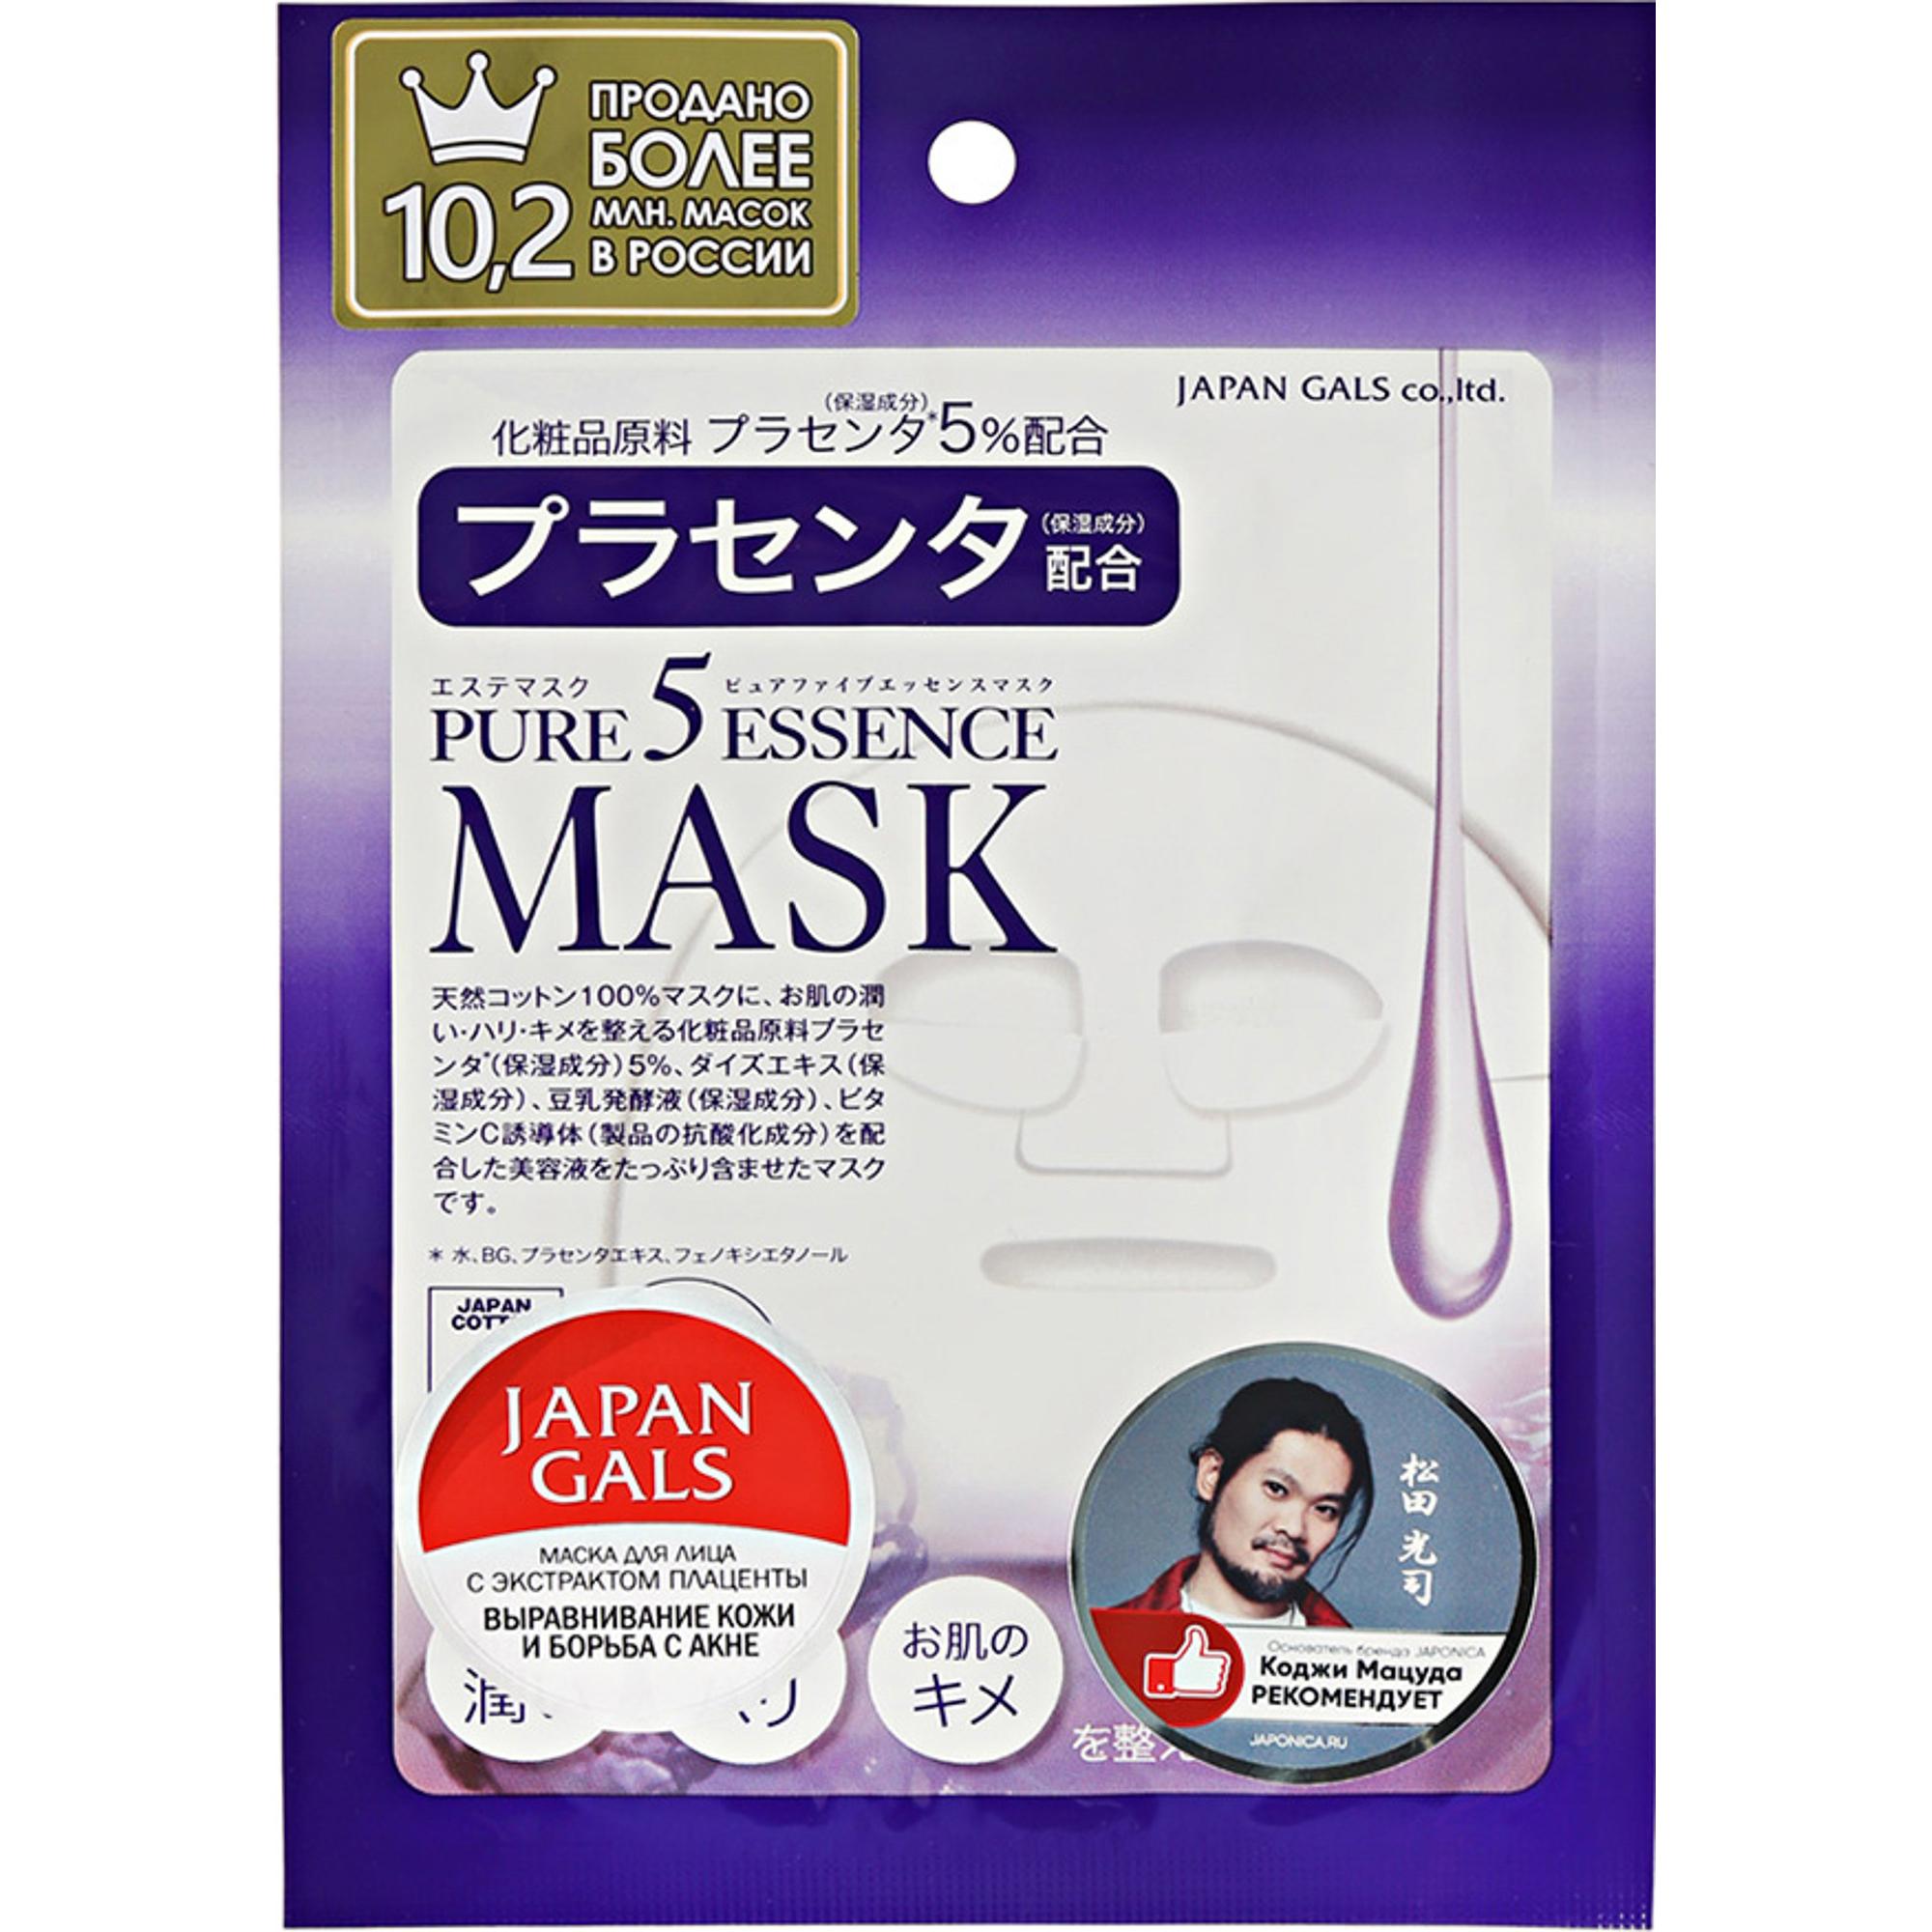 Маска для лица Japan Gals Pure 5 Essence С плацентой 1 шт